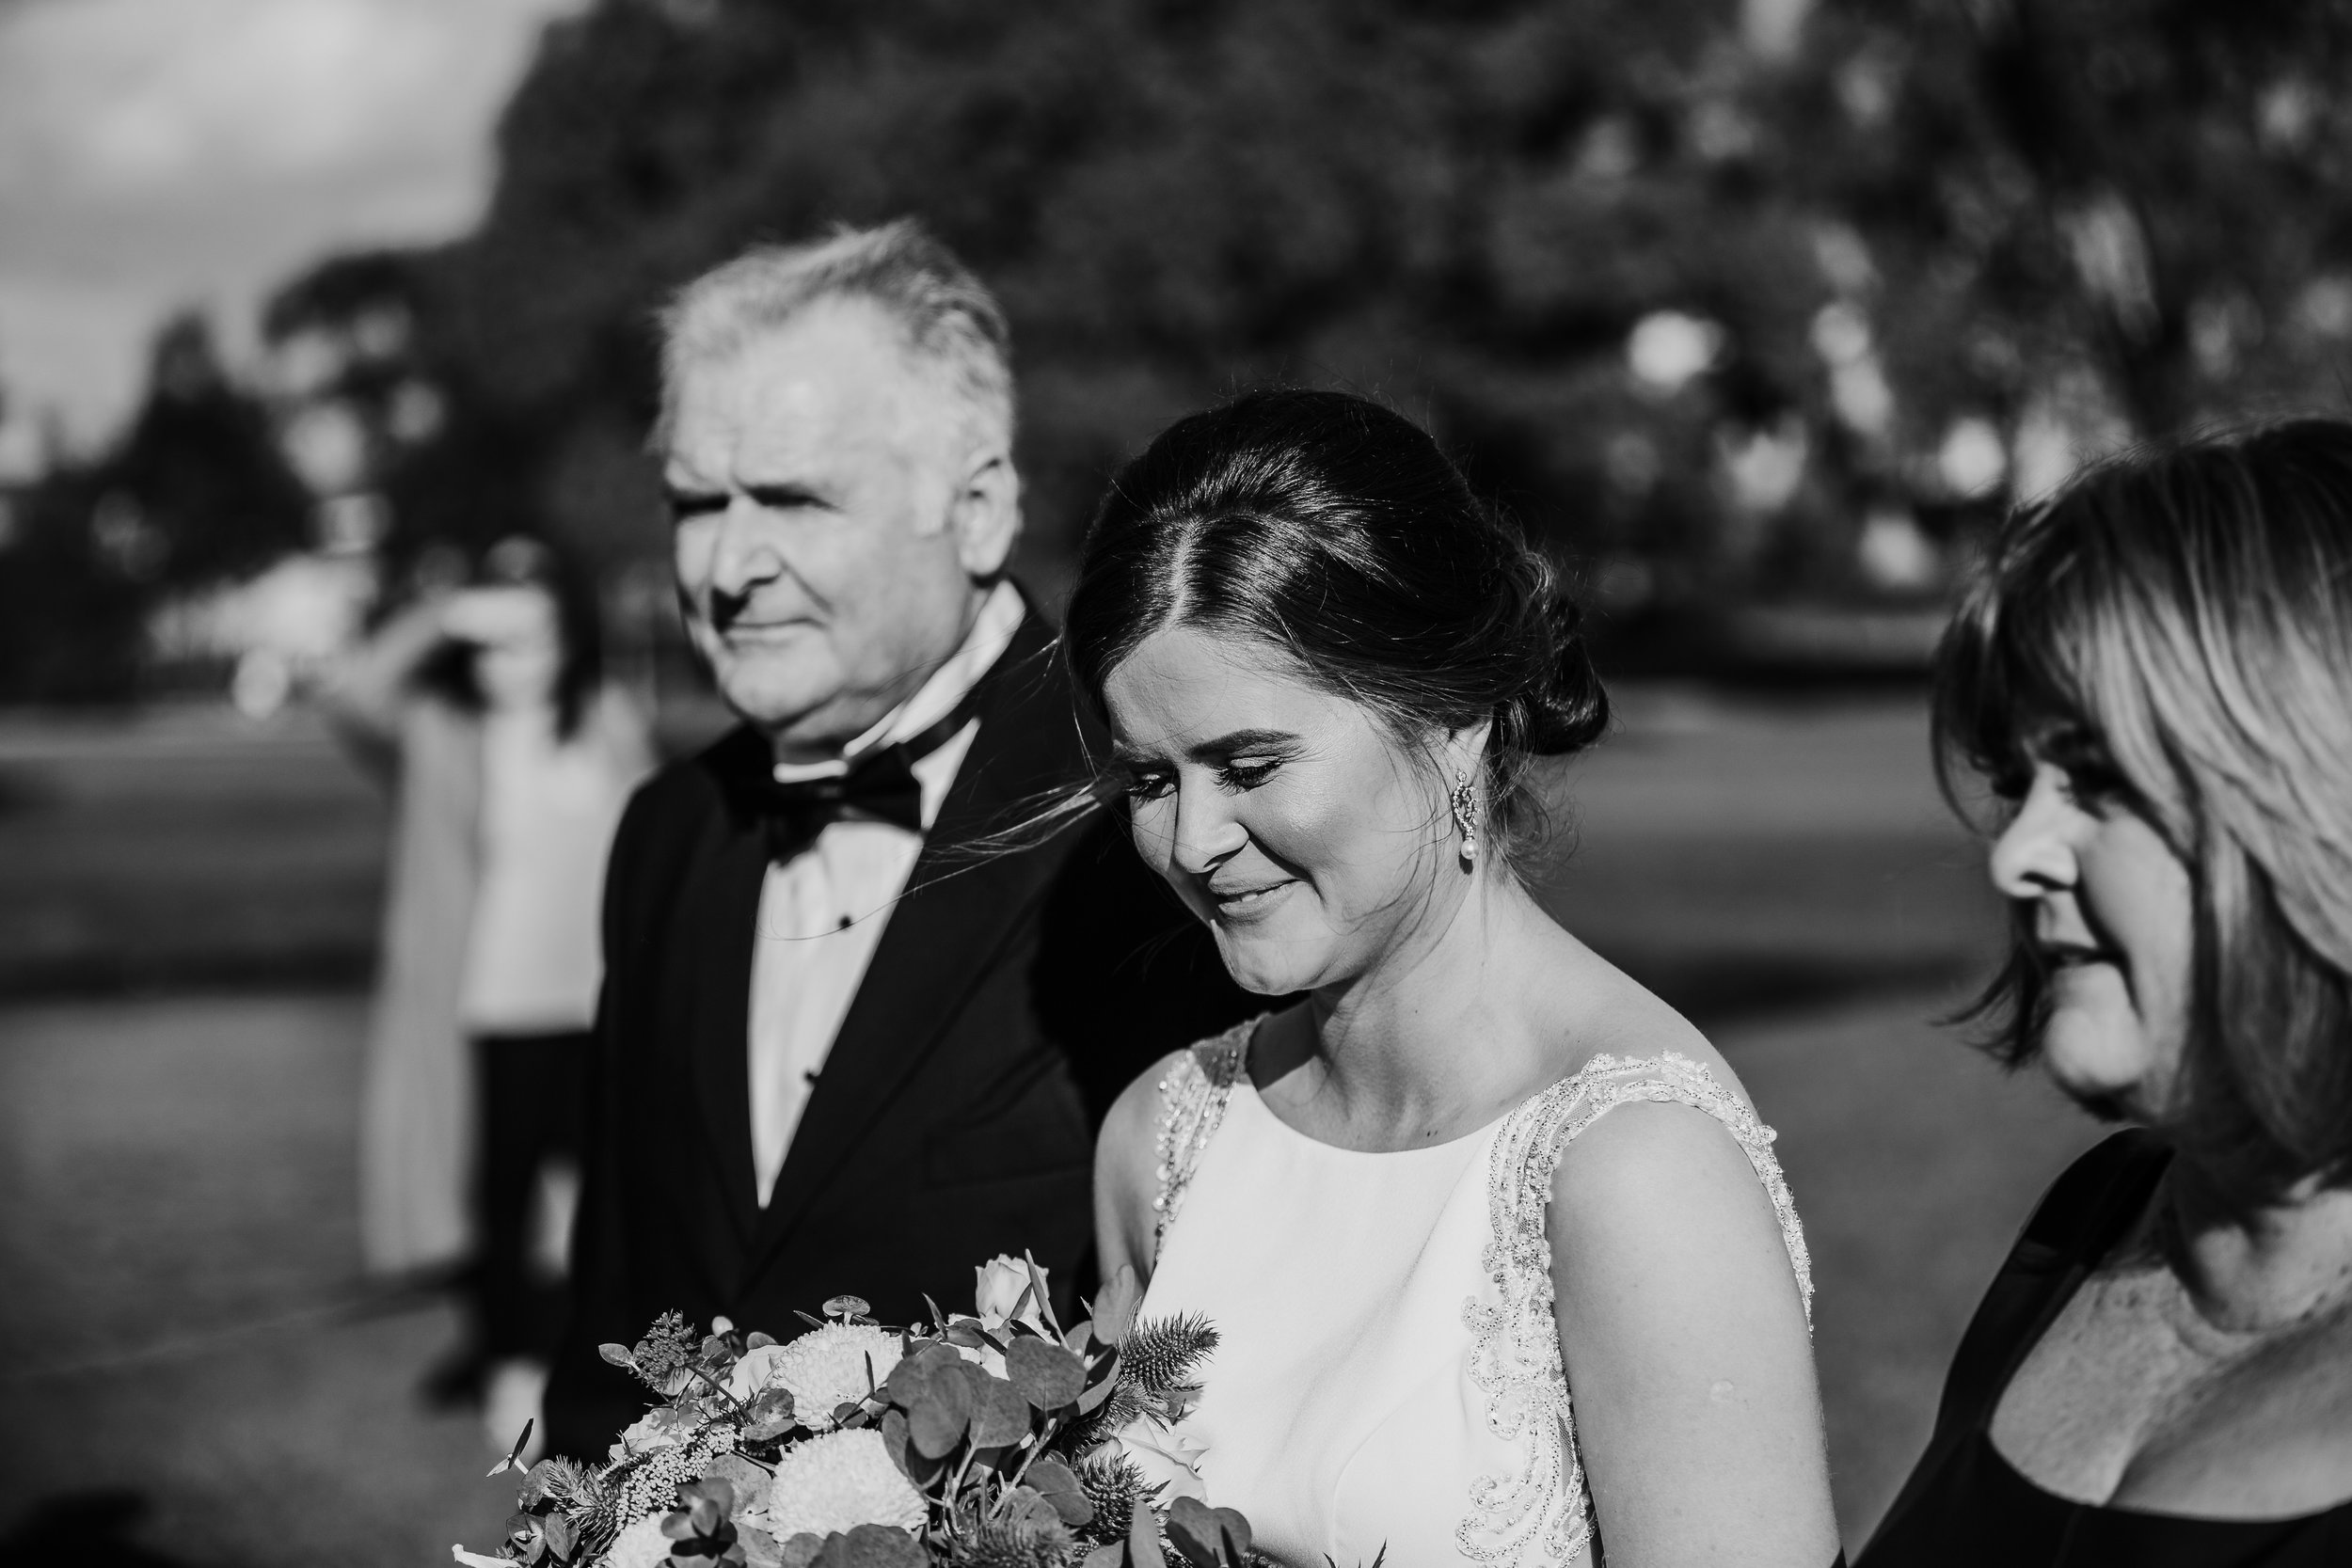 mickalathomas_puremacphotography_weddingphotographer_couplephotographer_Sheppartonphotographer_2532.jpg